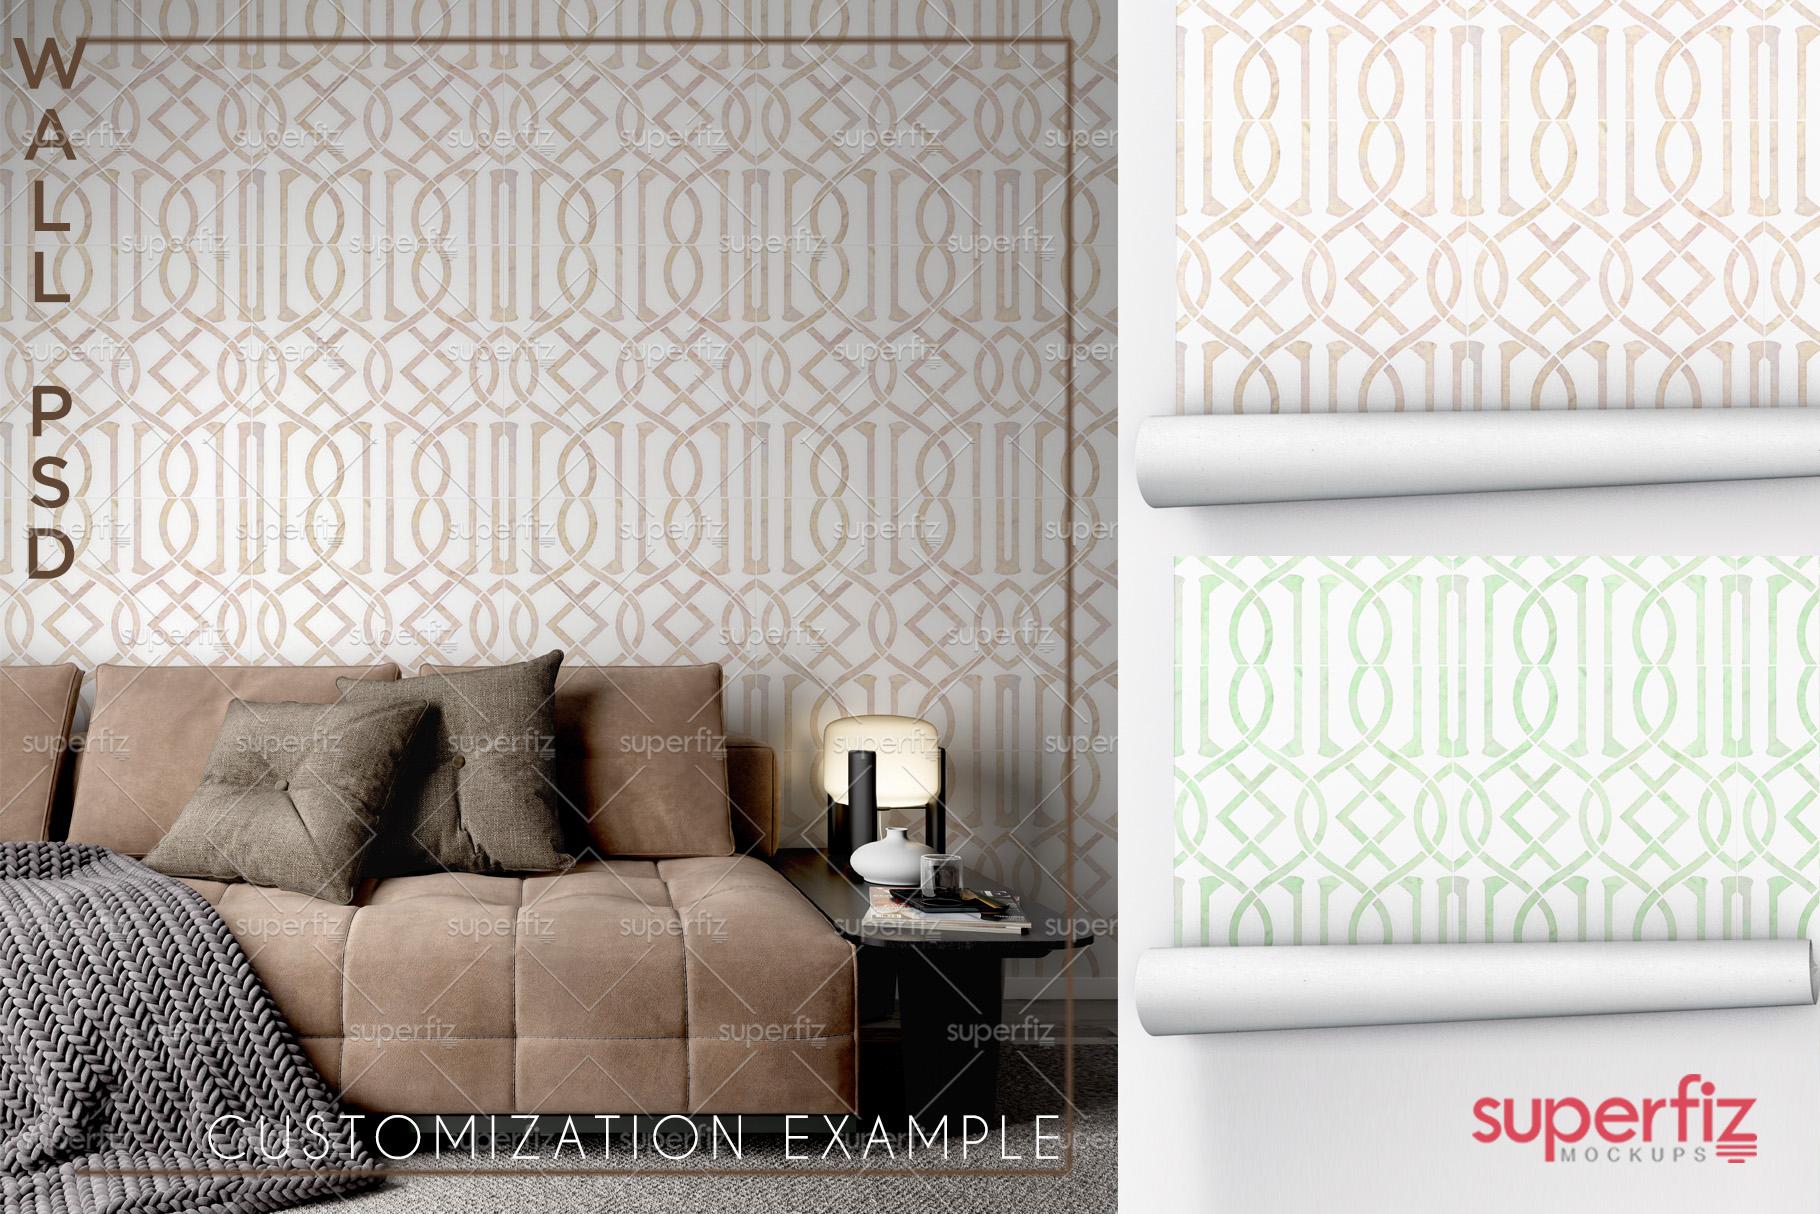 Wallpaper Mockup Bundle Vol.2 - SM98PACK - 5PSD SCENE example image 10